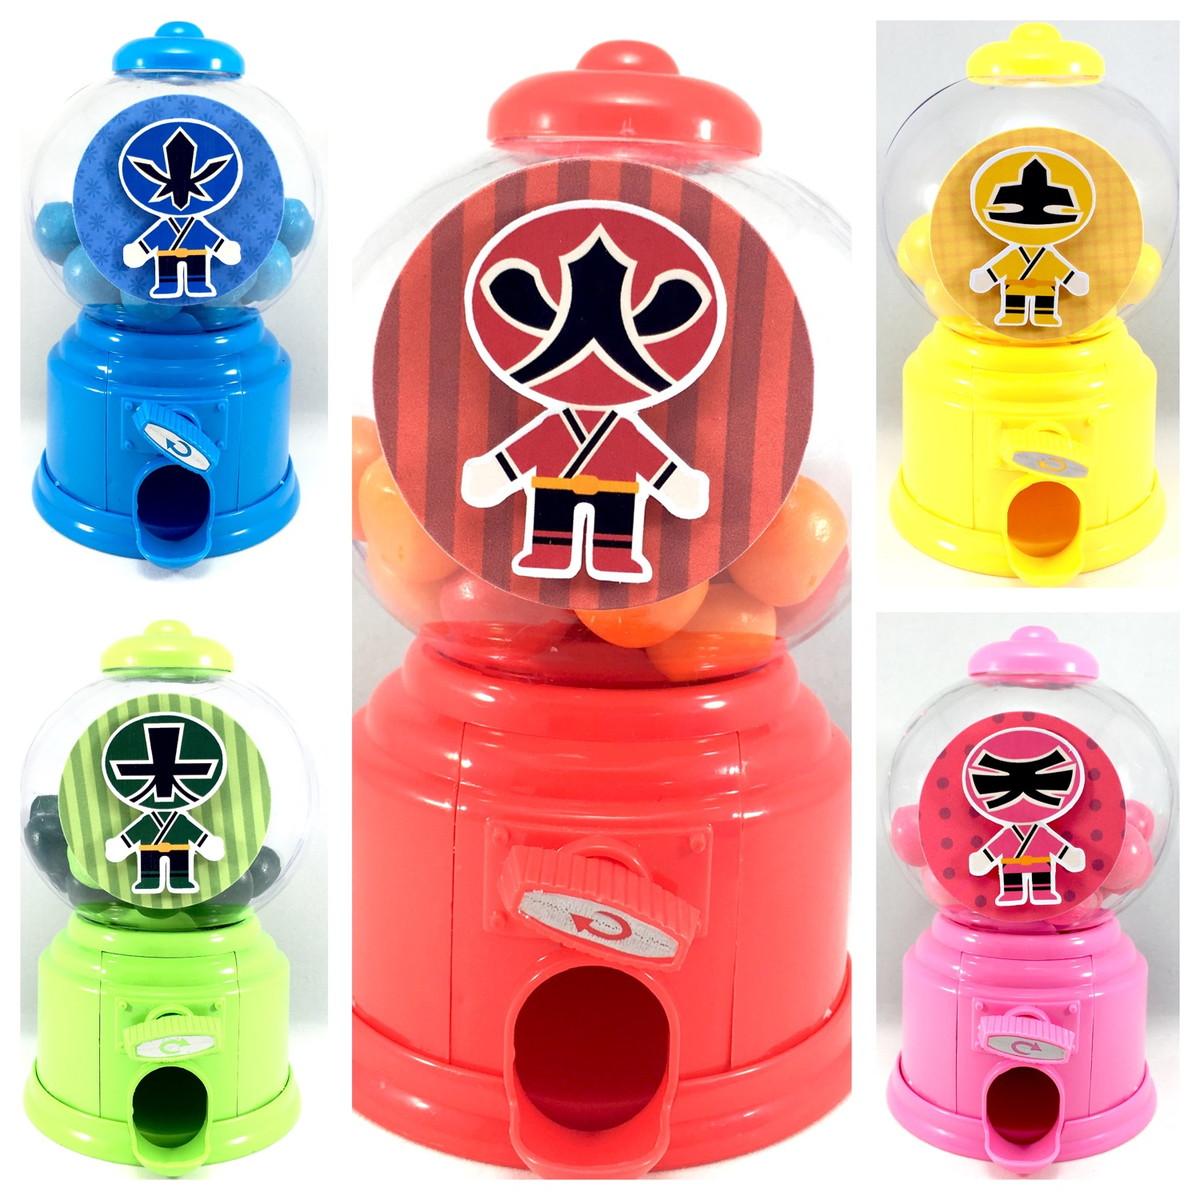 Candy Machine - Power Rangers  - Marina Levy Festas